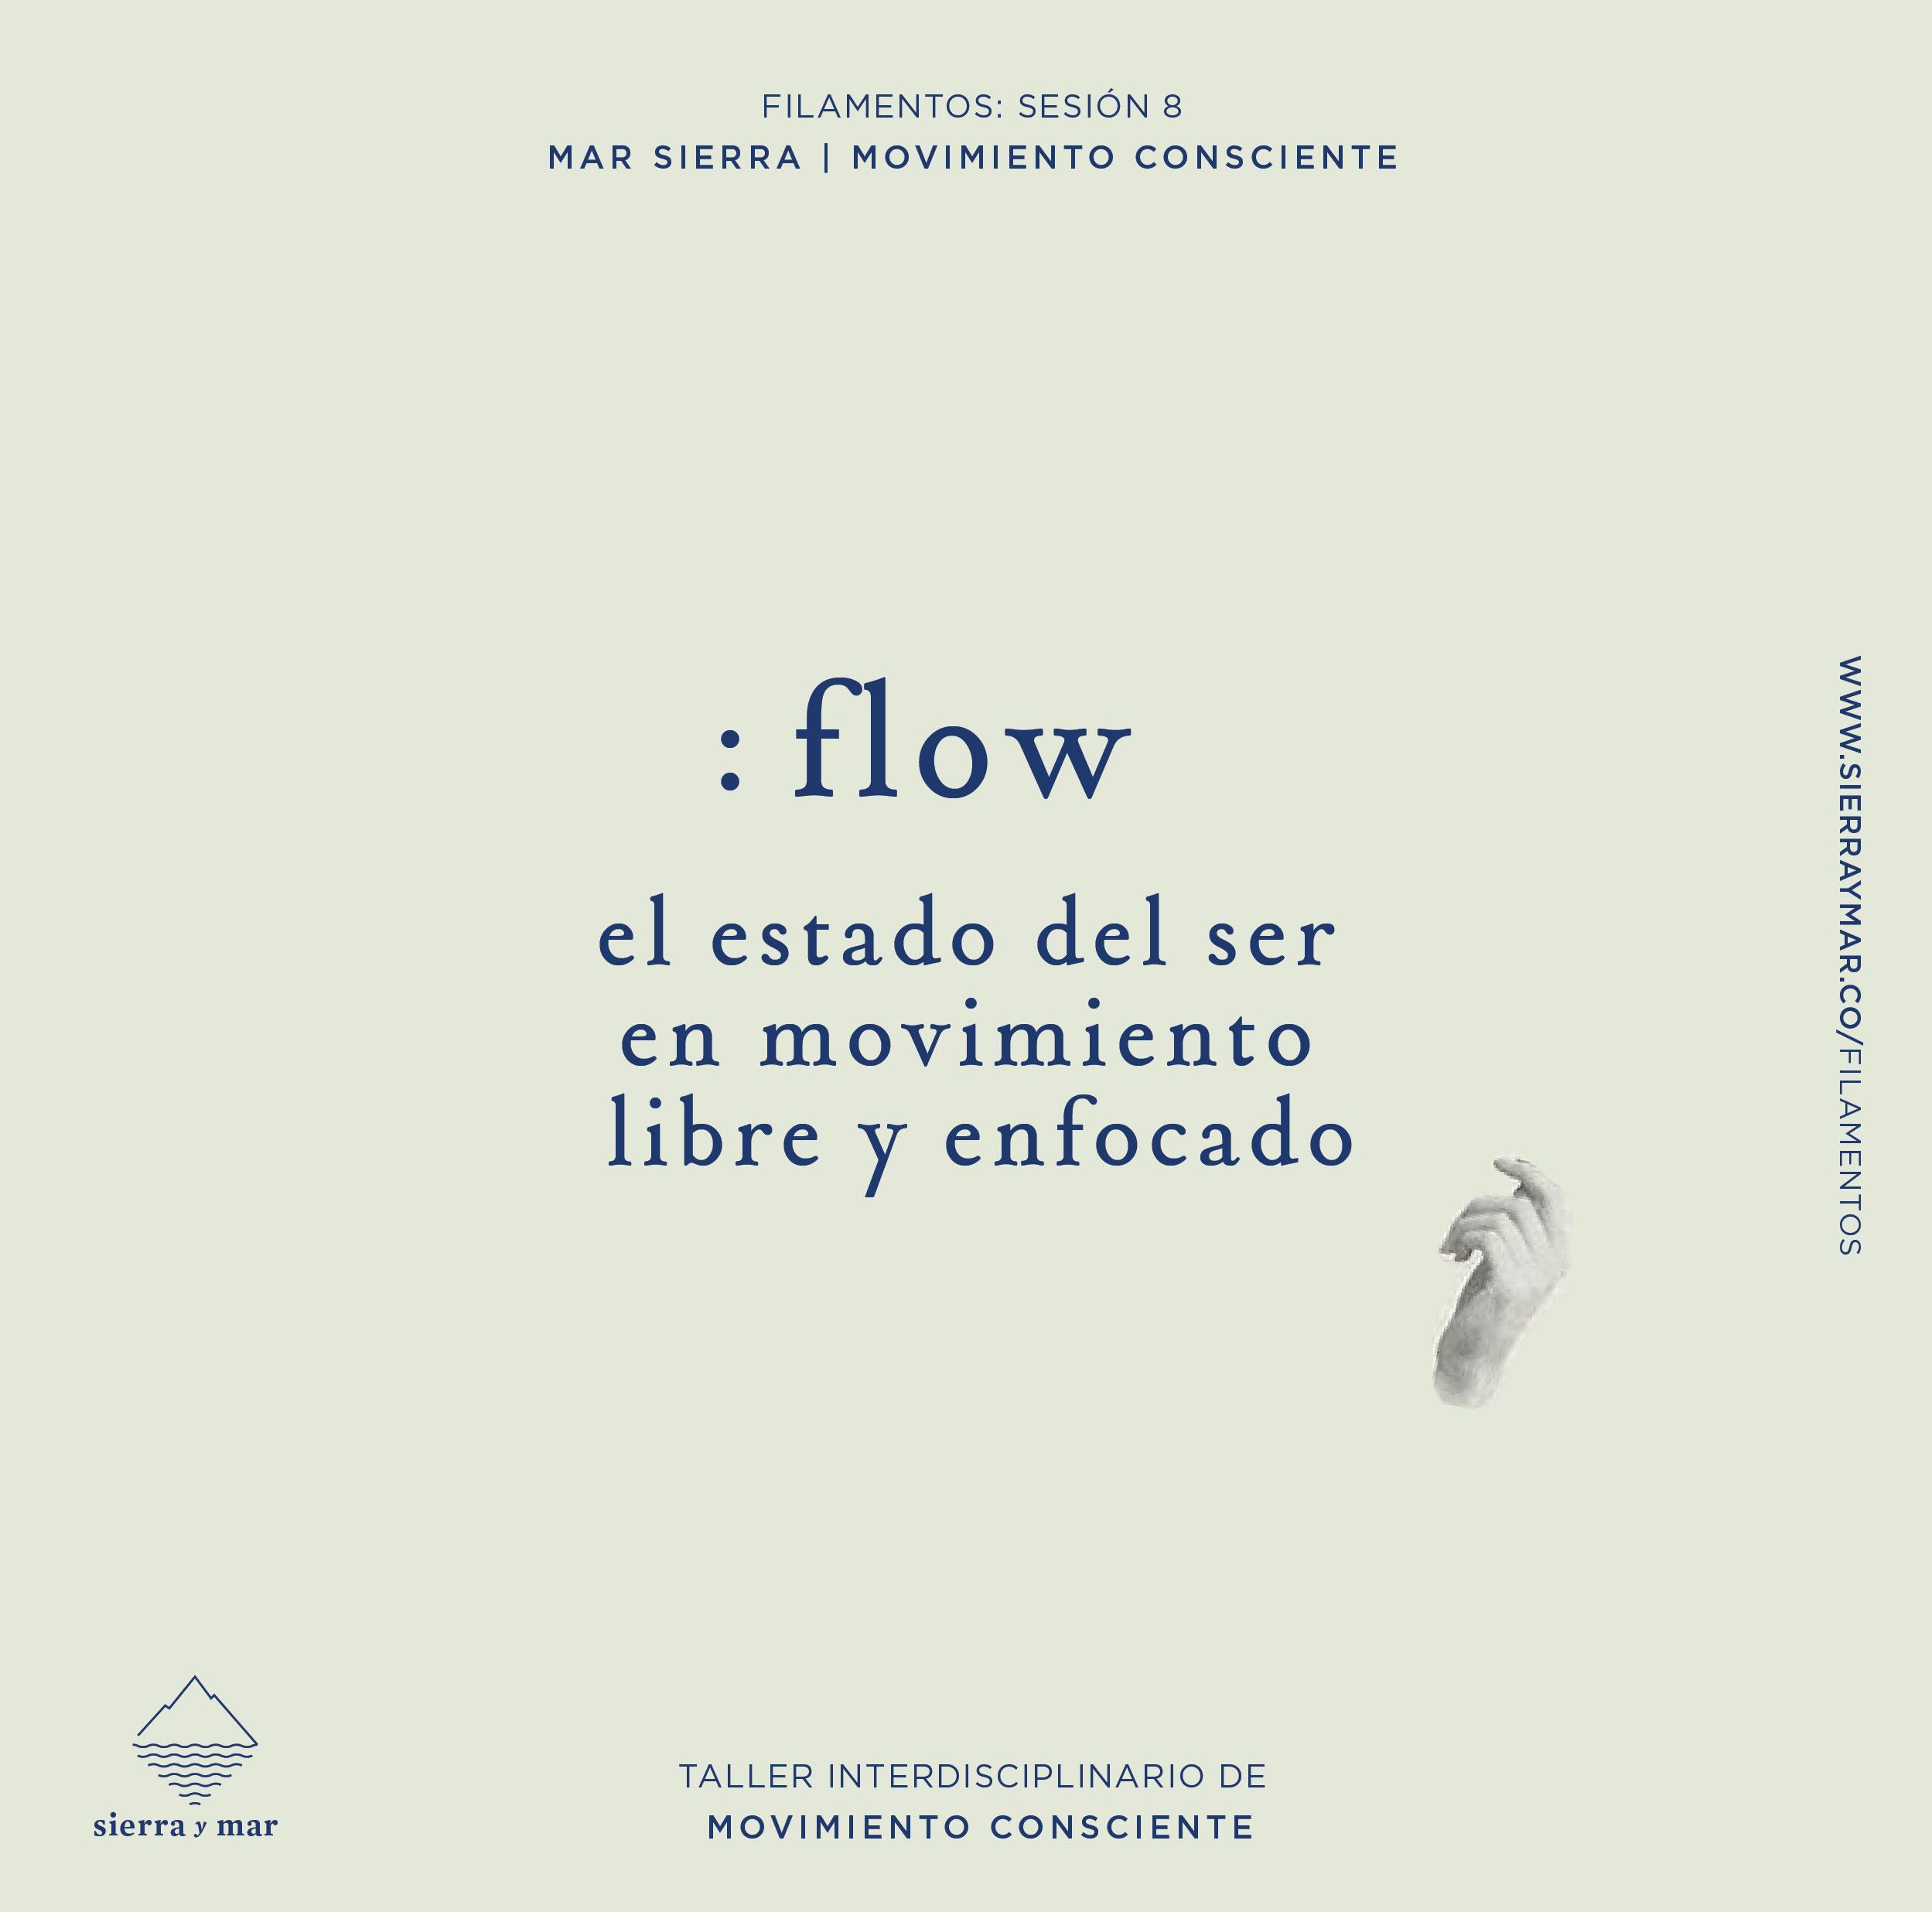 Filamentos-texts-24.jpg